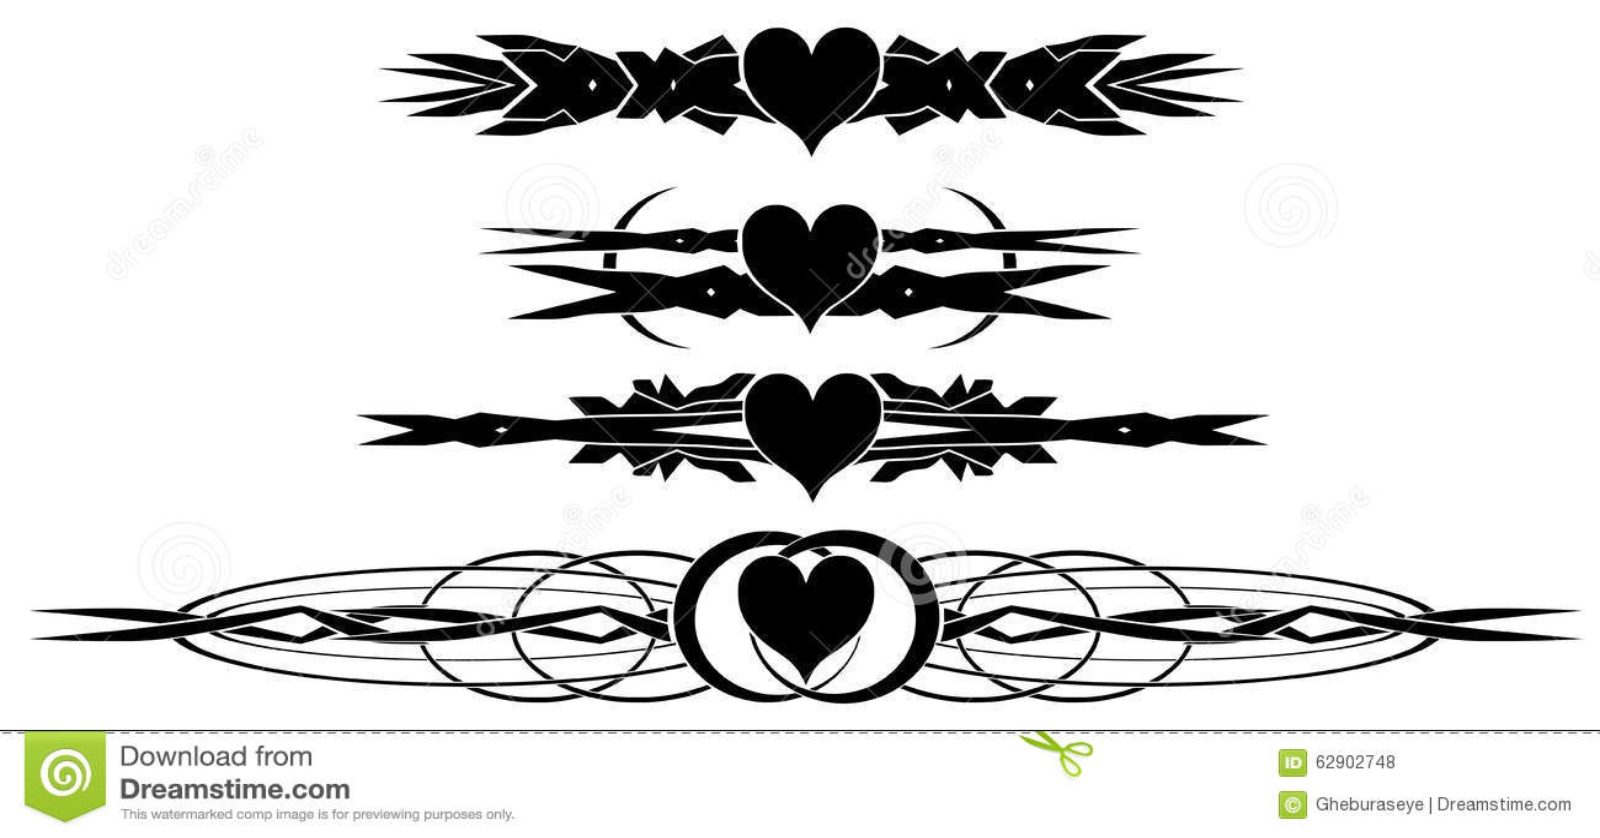 картинки татуировок сердец